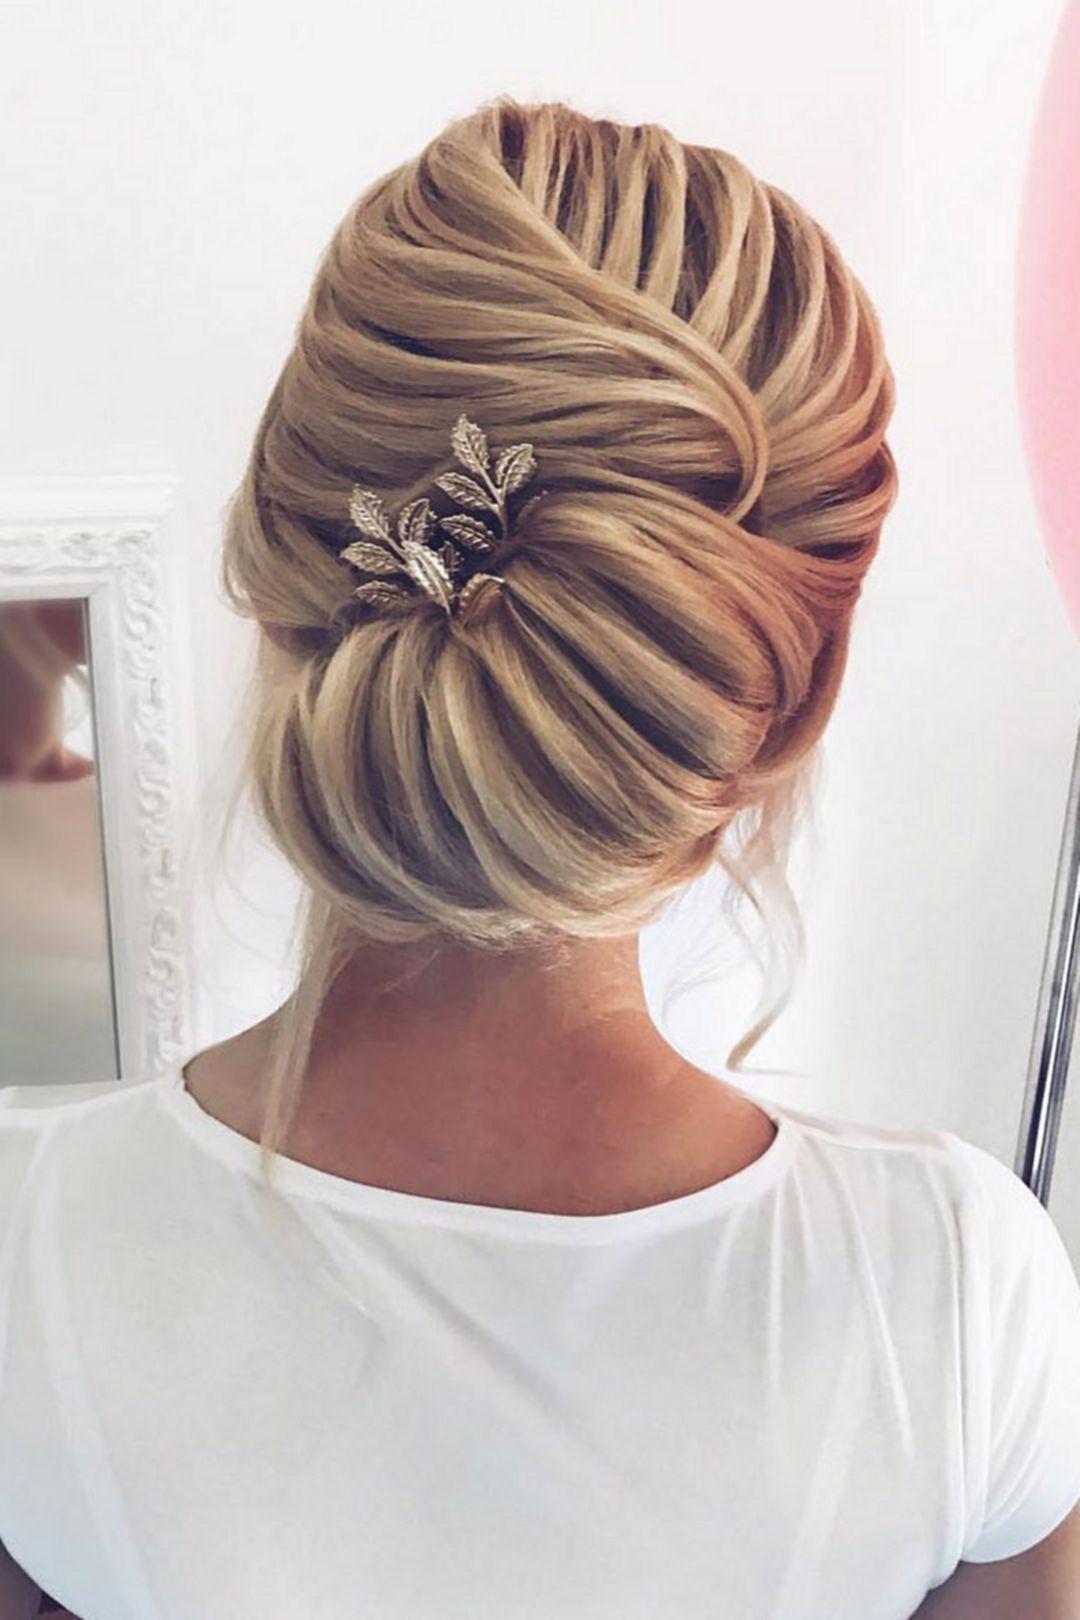 Pin by christina garofalo on bridal hair trial in pinterest